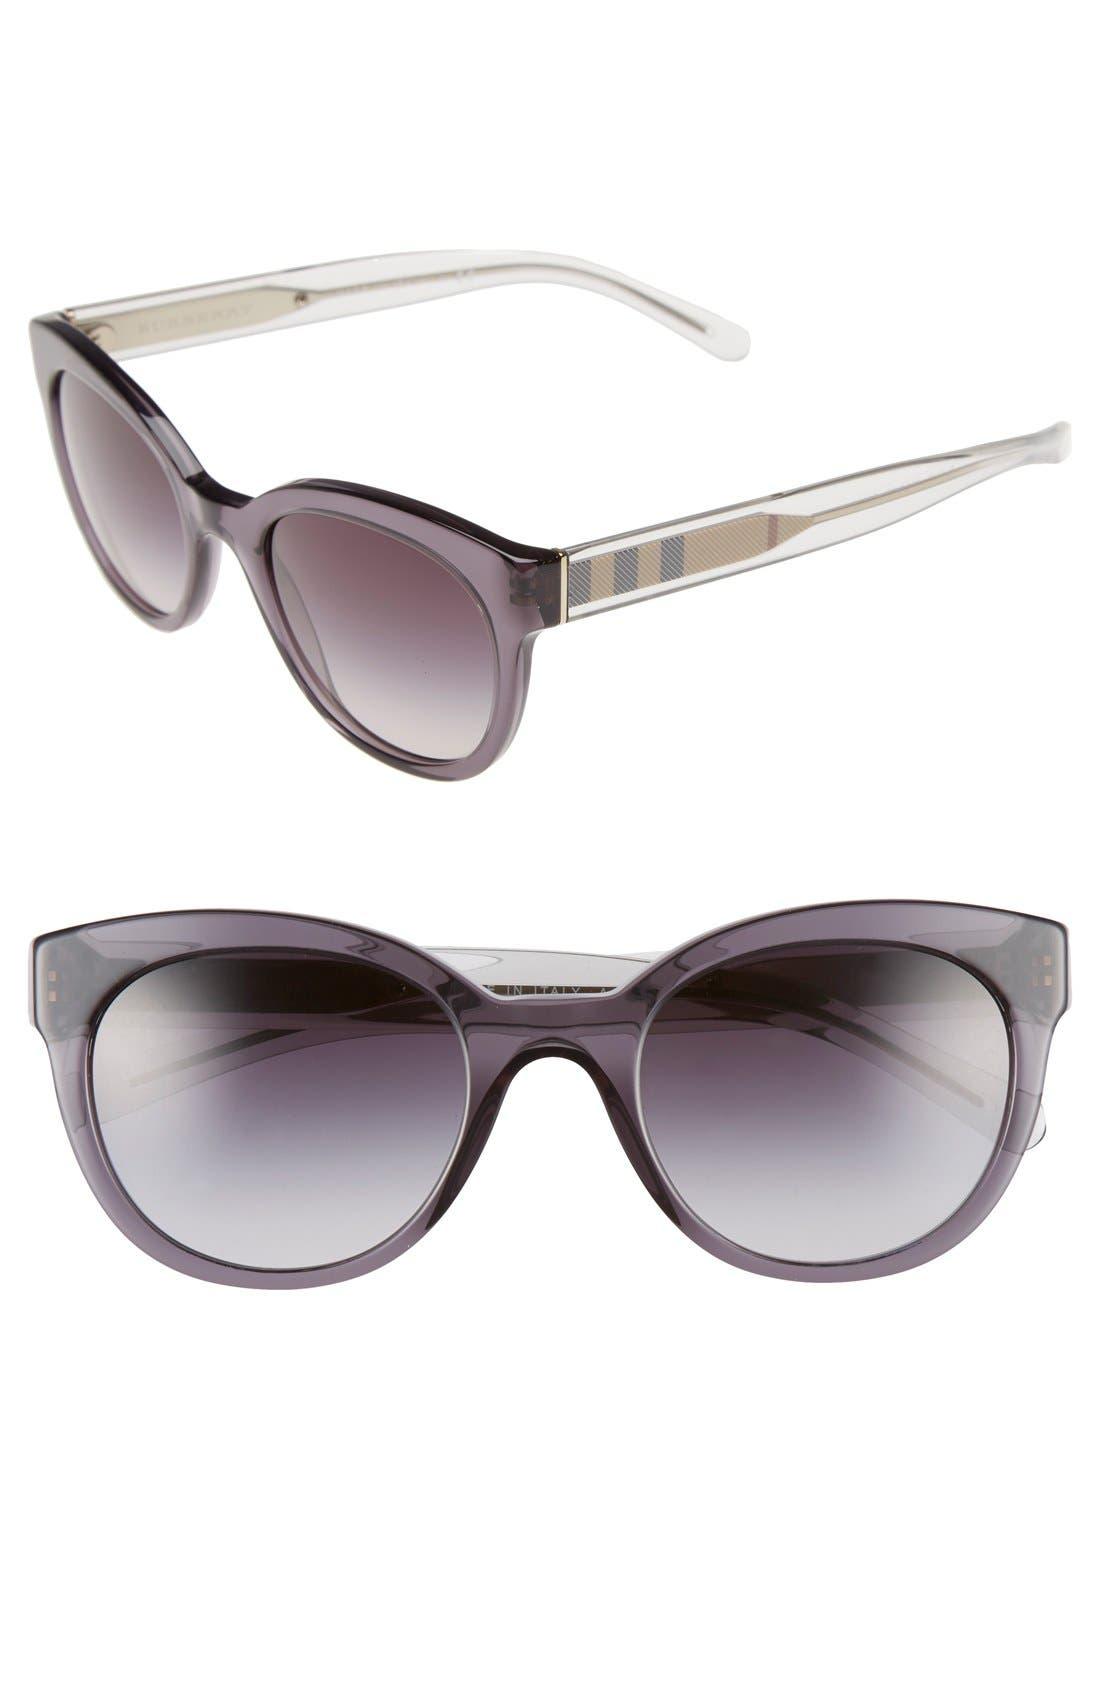 Alternate Image 1 Selected - Burberry 52mm Retro Sunglasses